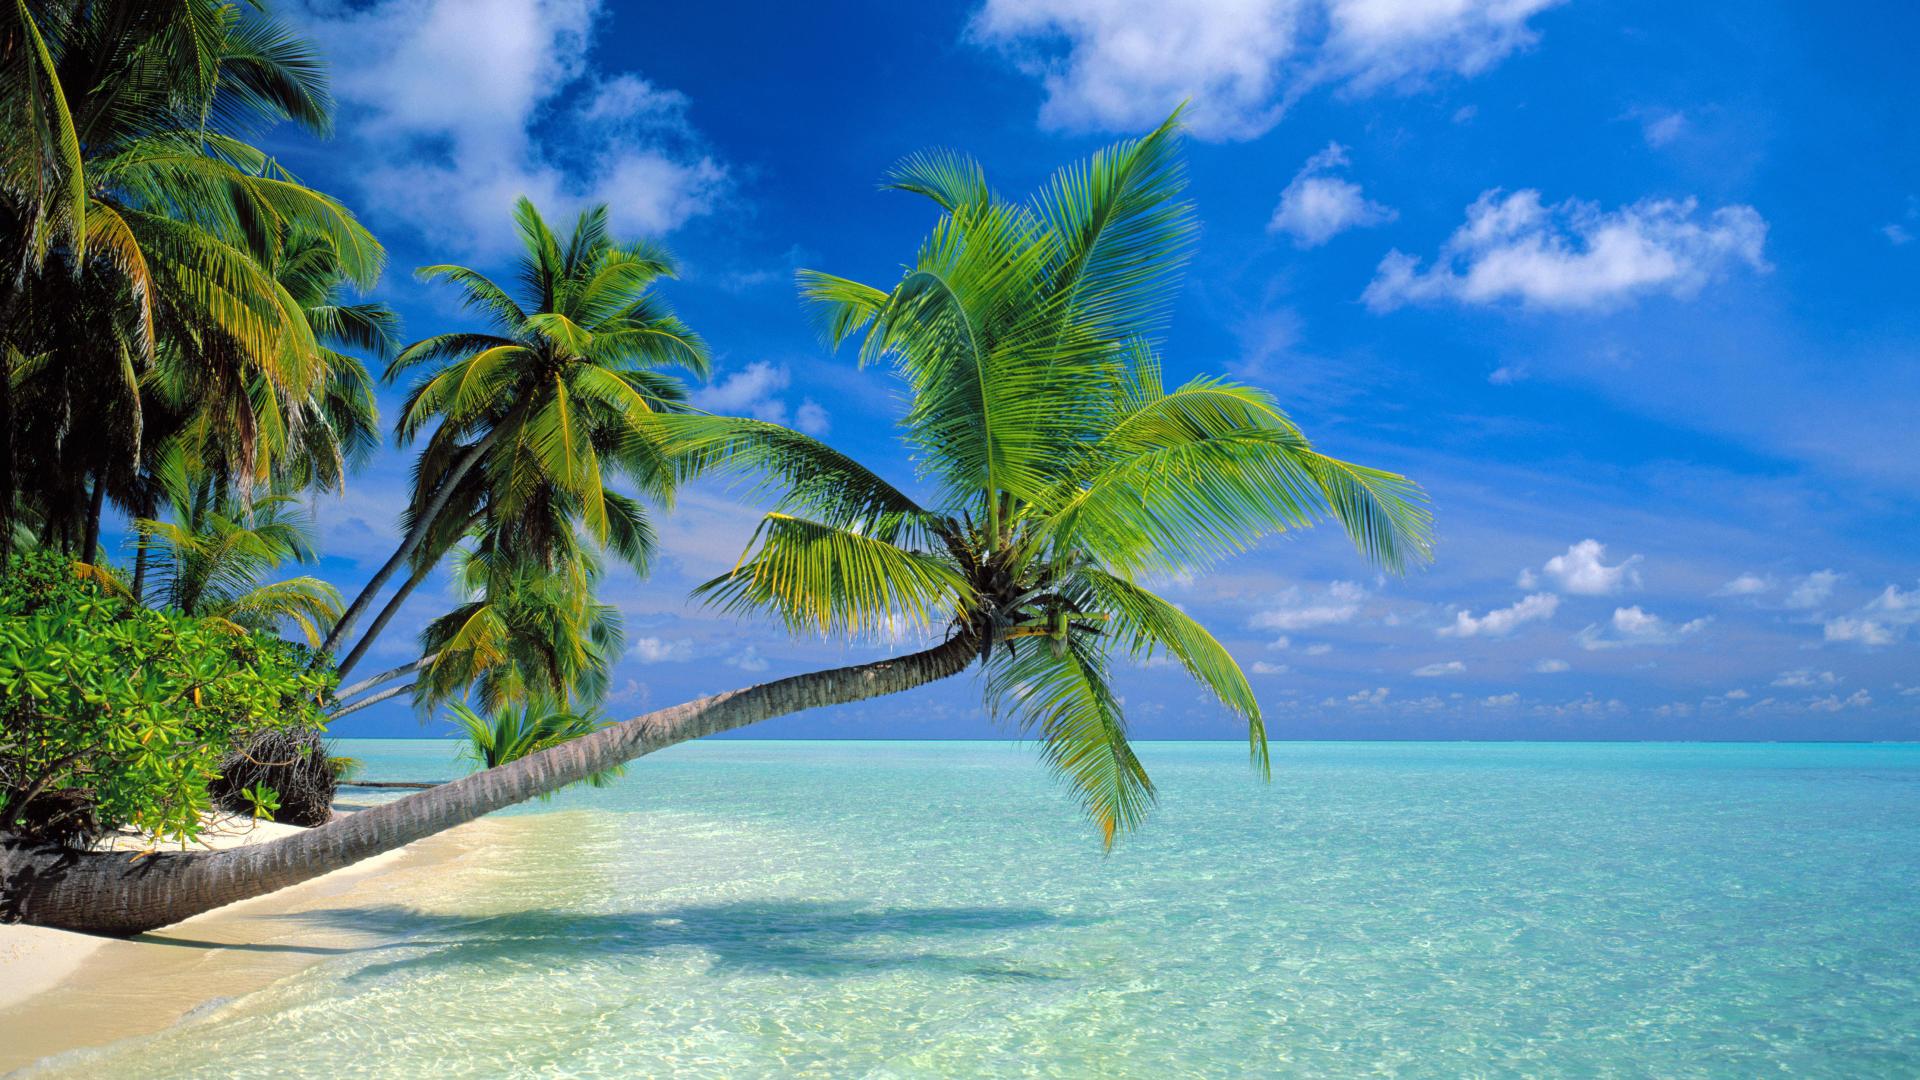 Another Paradise Maldives 3939 Wallpaper Wallpaper hd 1920x1080